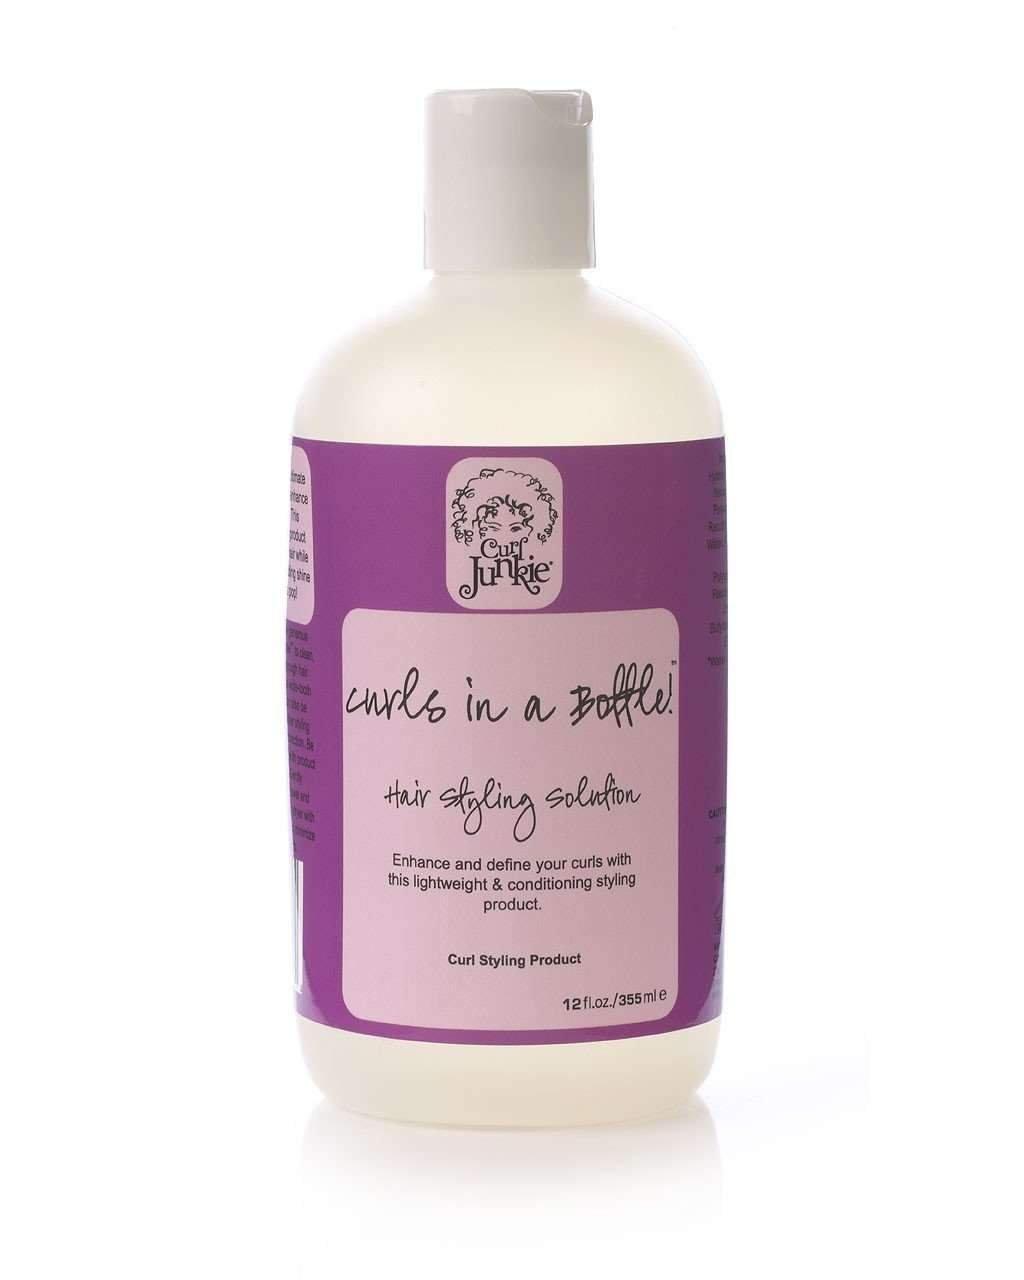 Curl Junkie Curls in a Bottle! Hair Styling Solution - 12 oz